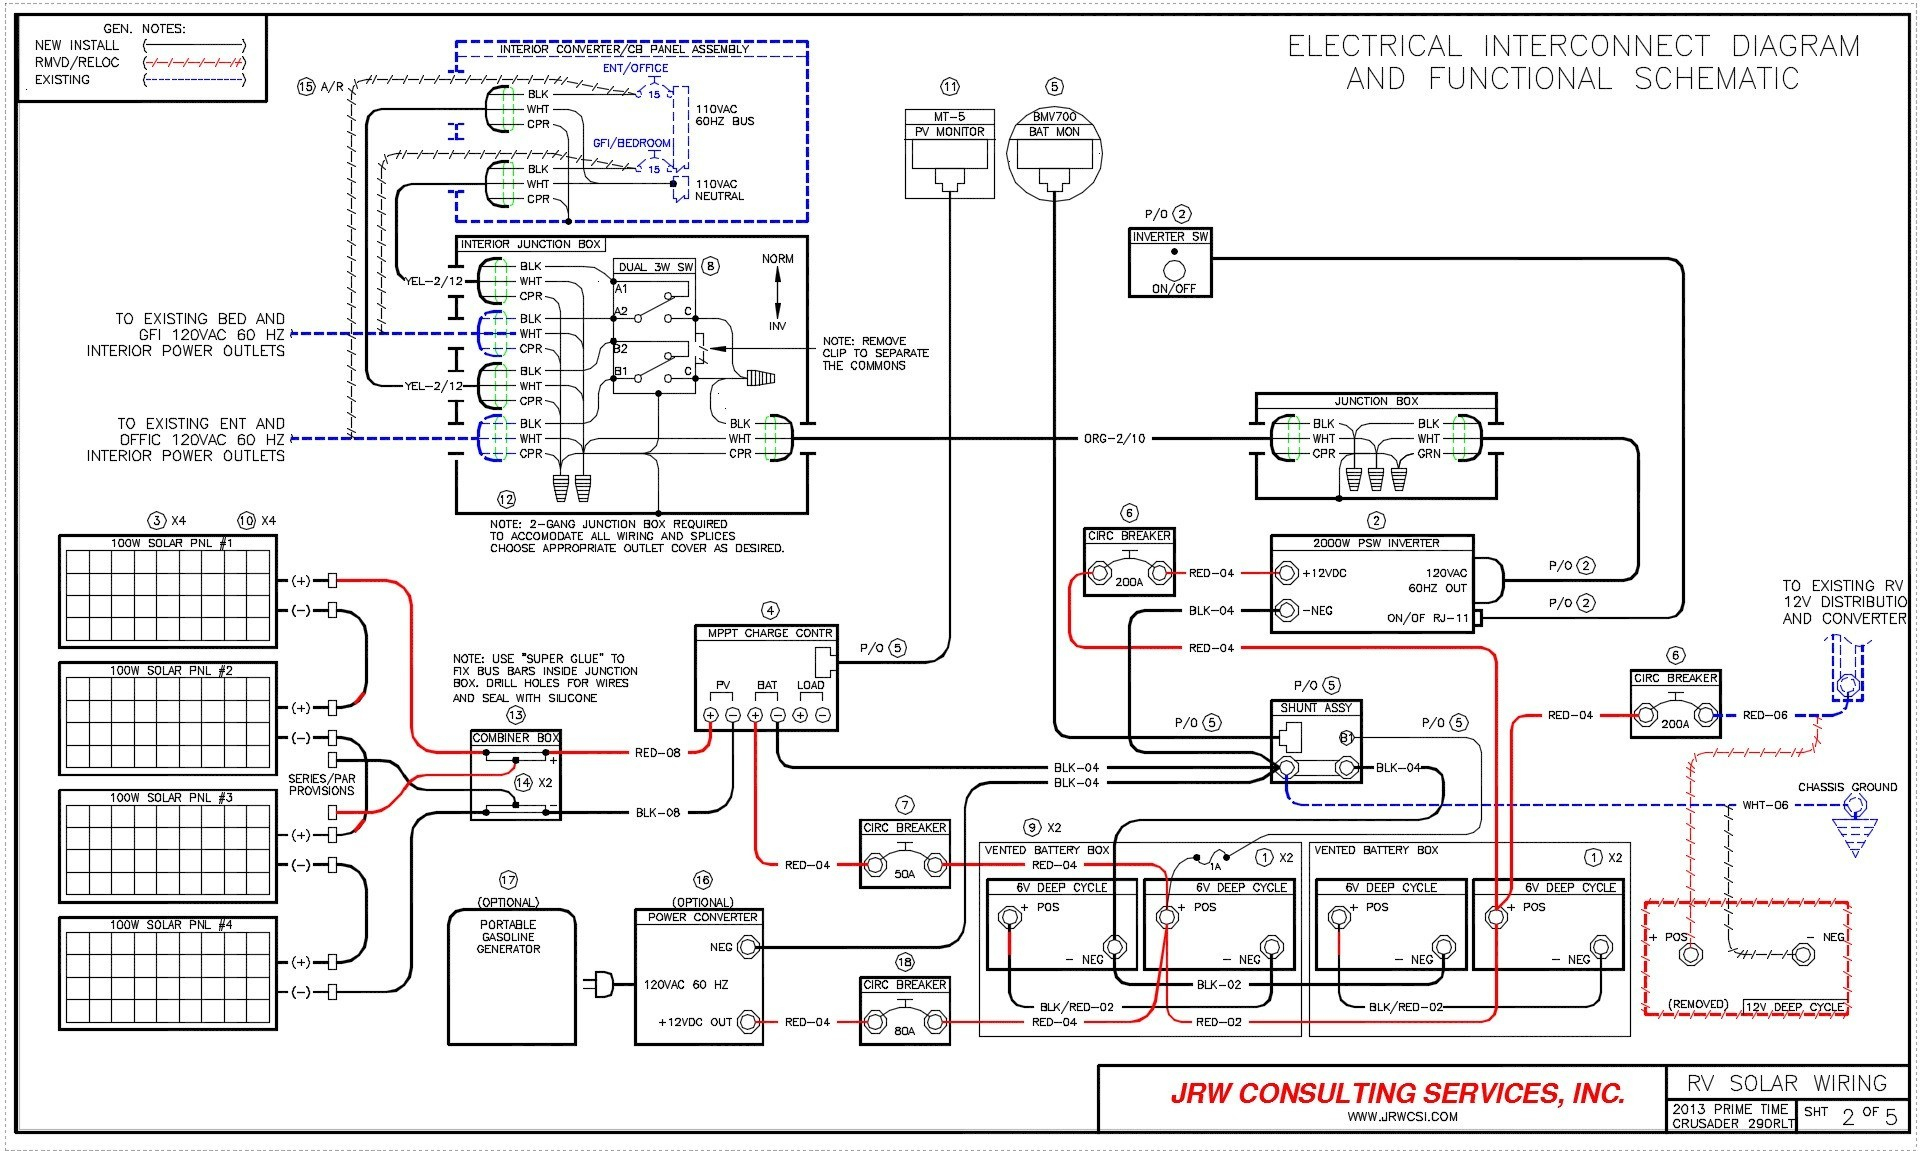 Holiday Rambler Rv Wiring Diagram - Data Wiring Diagram Today - Monaco Rv Wiring Diagram